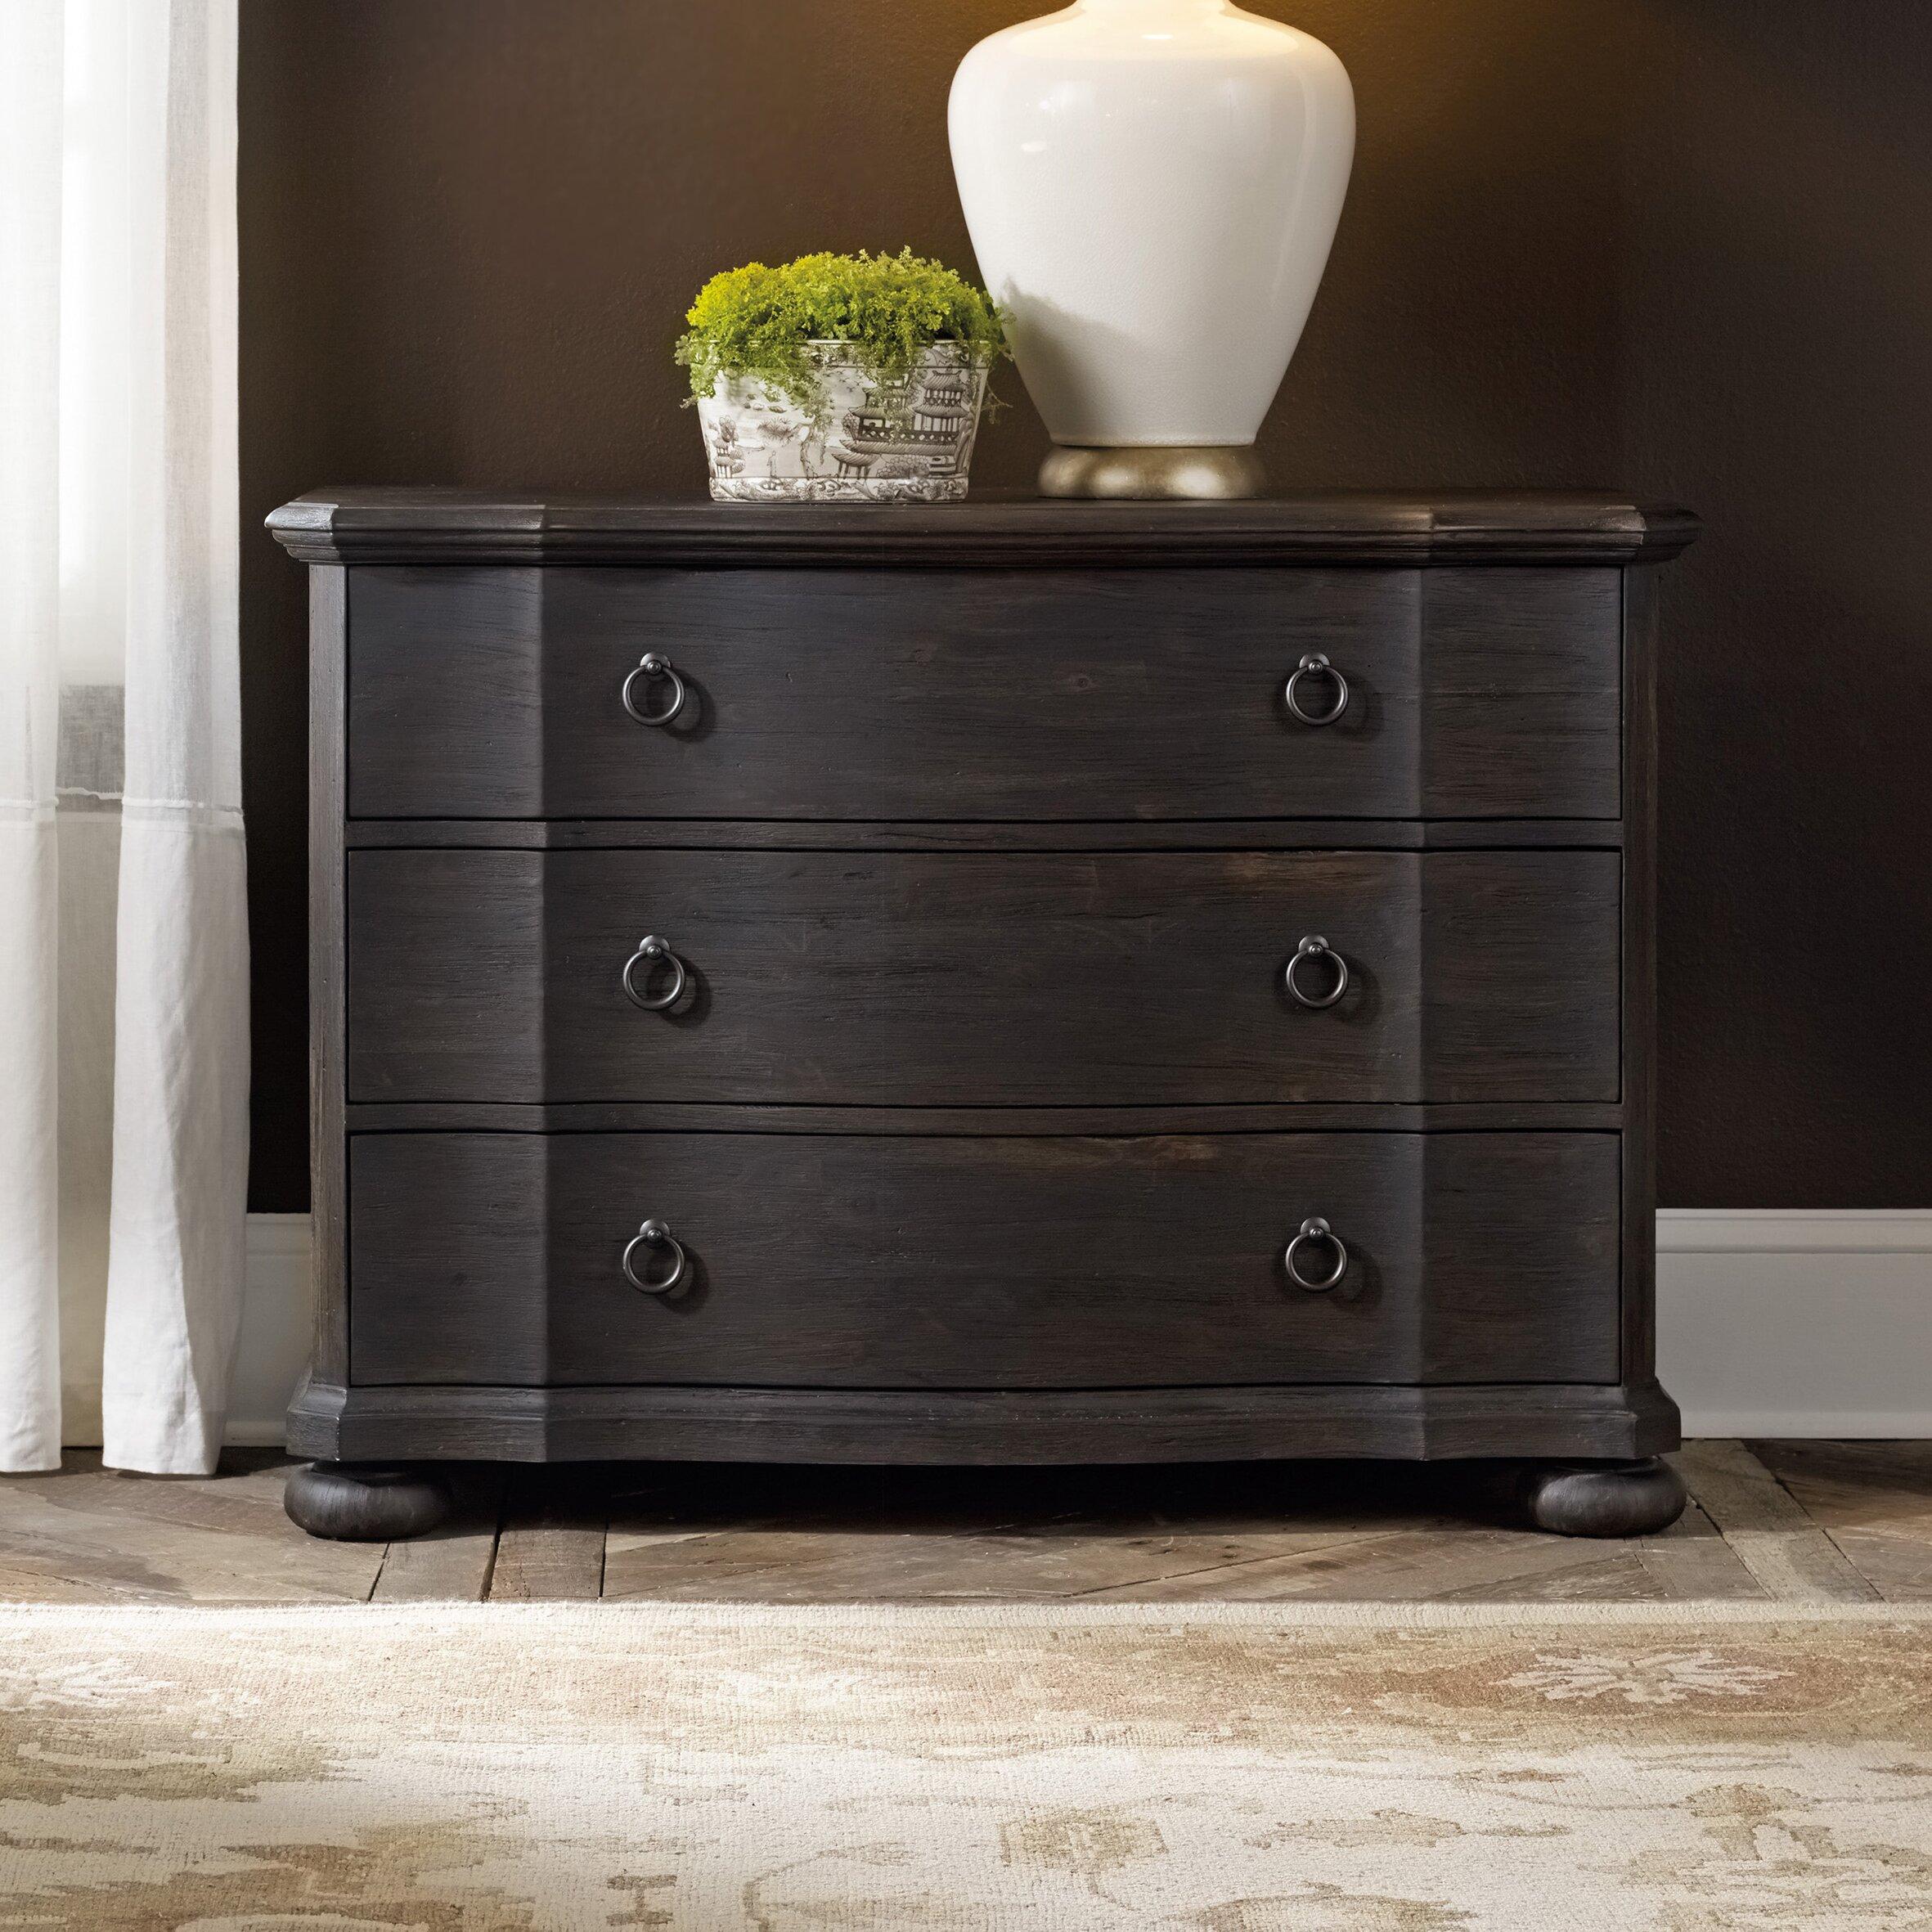 Hooker Furniture Corsica 3 Drawer Bachelor 39 S Chest